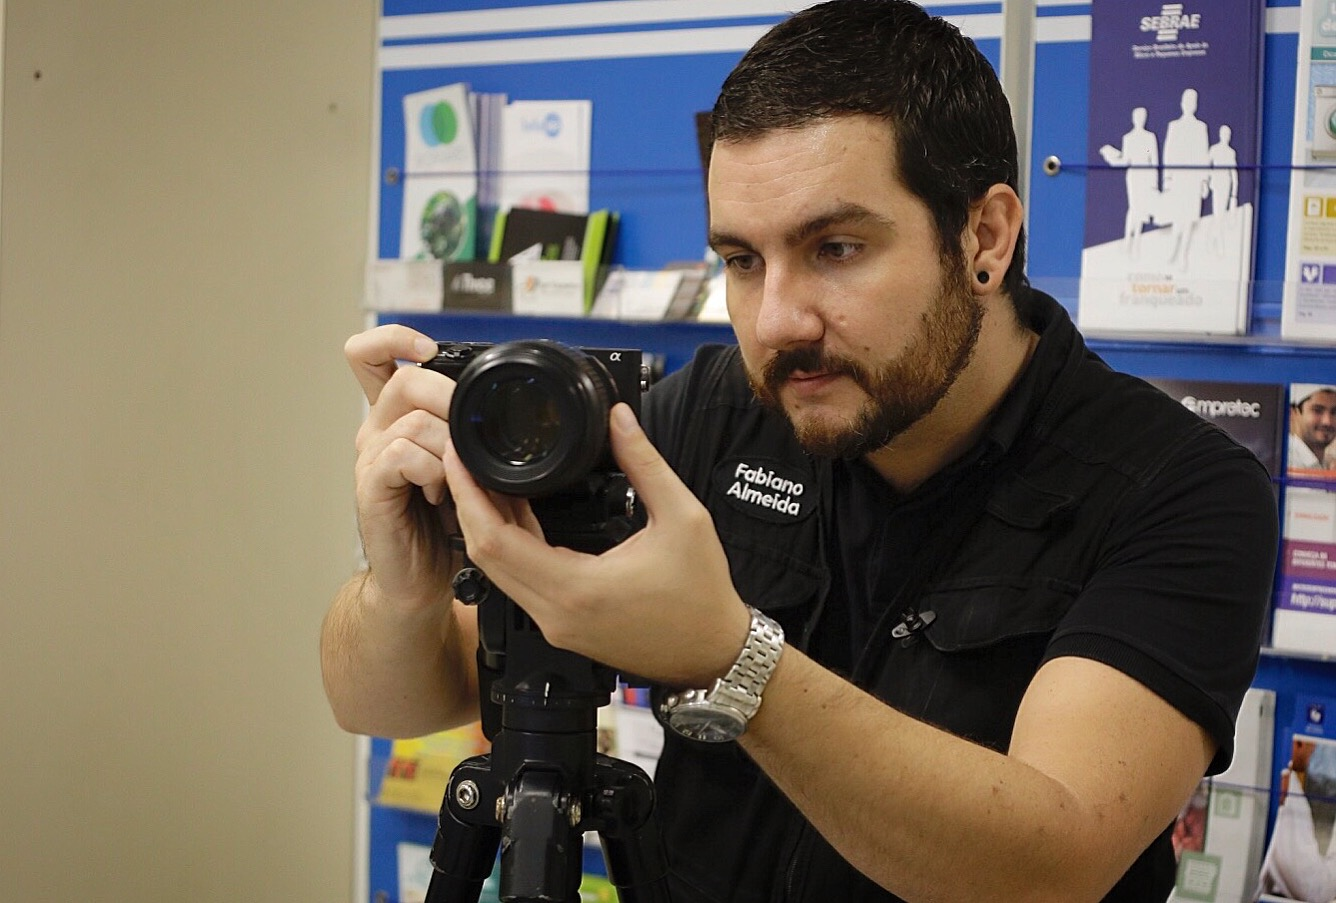 Fabiano Almeida Fotografia e Cinema